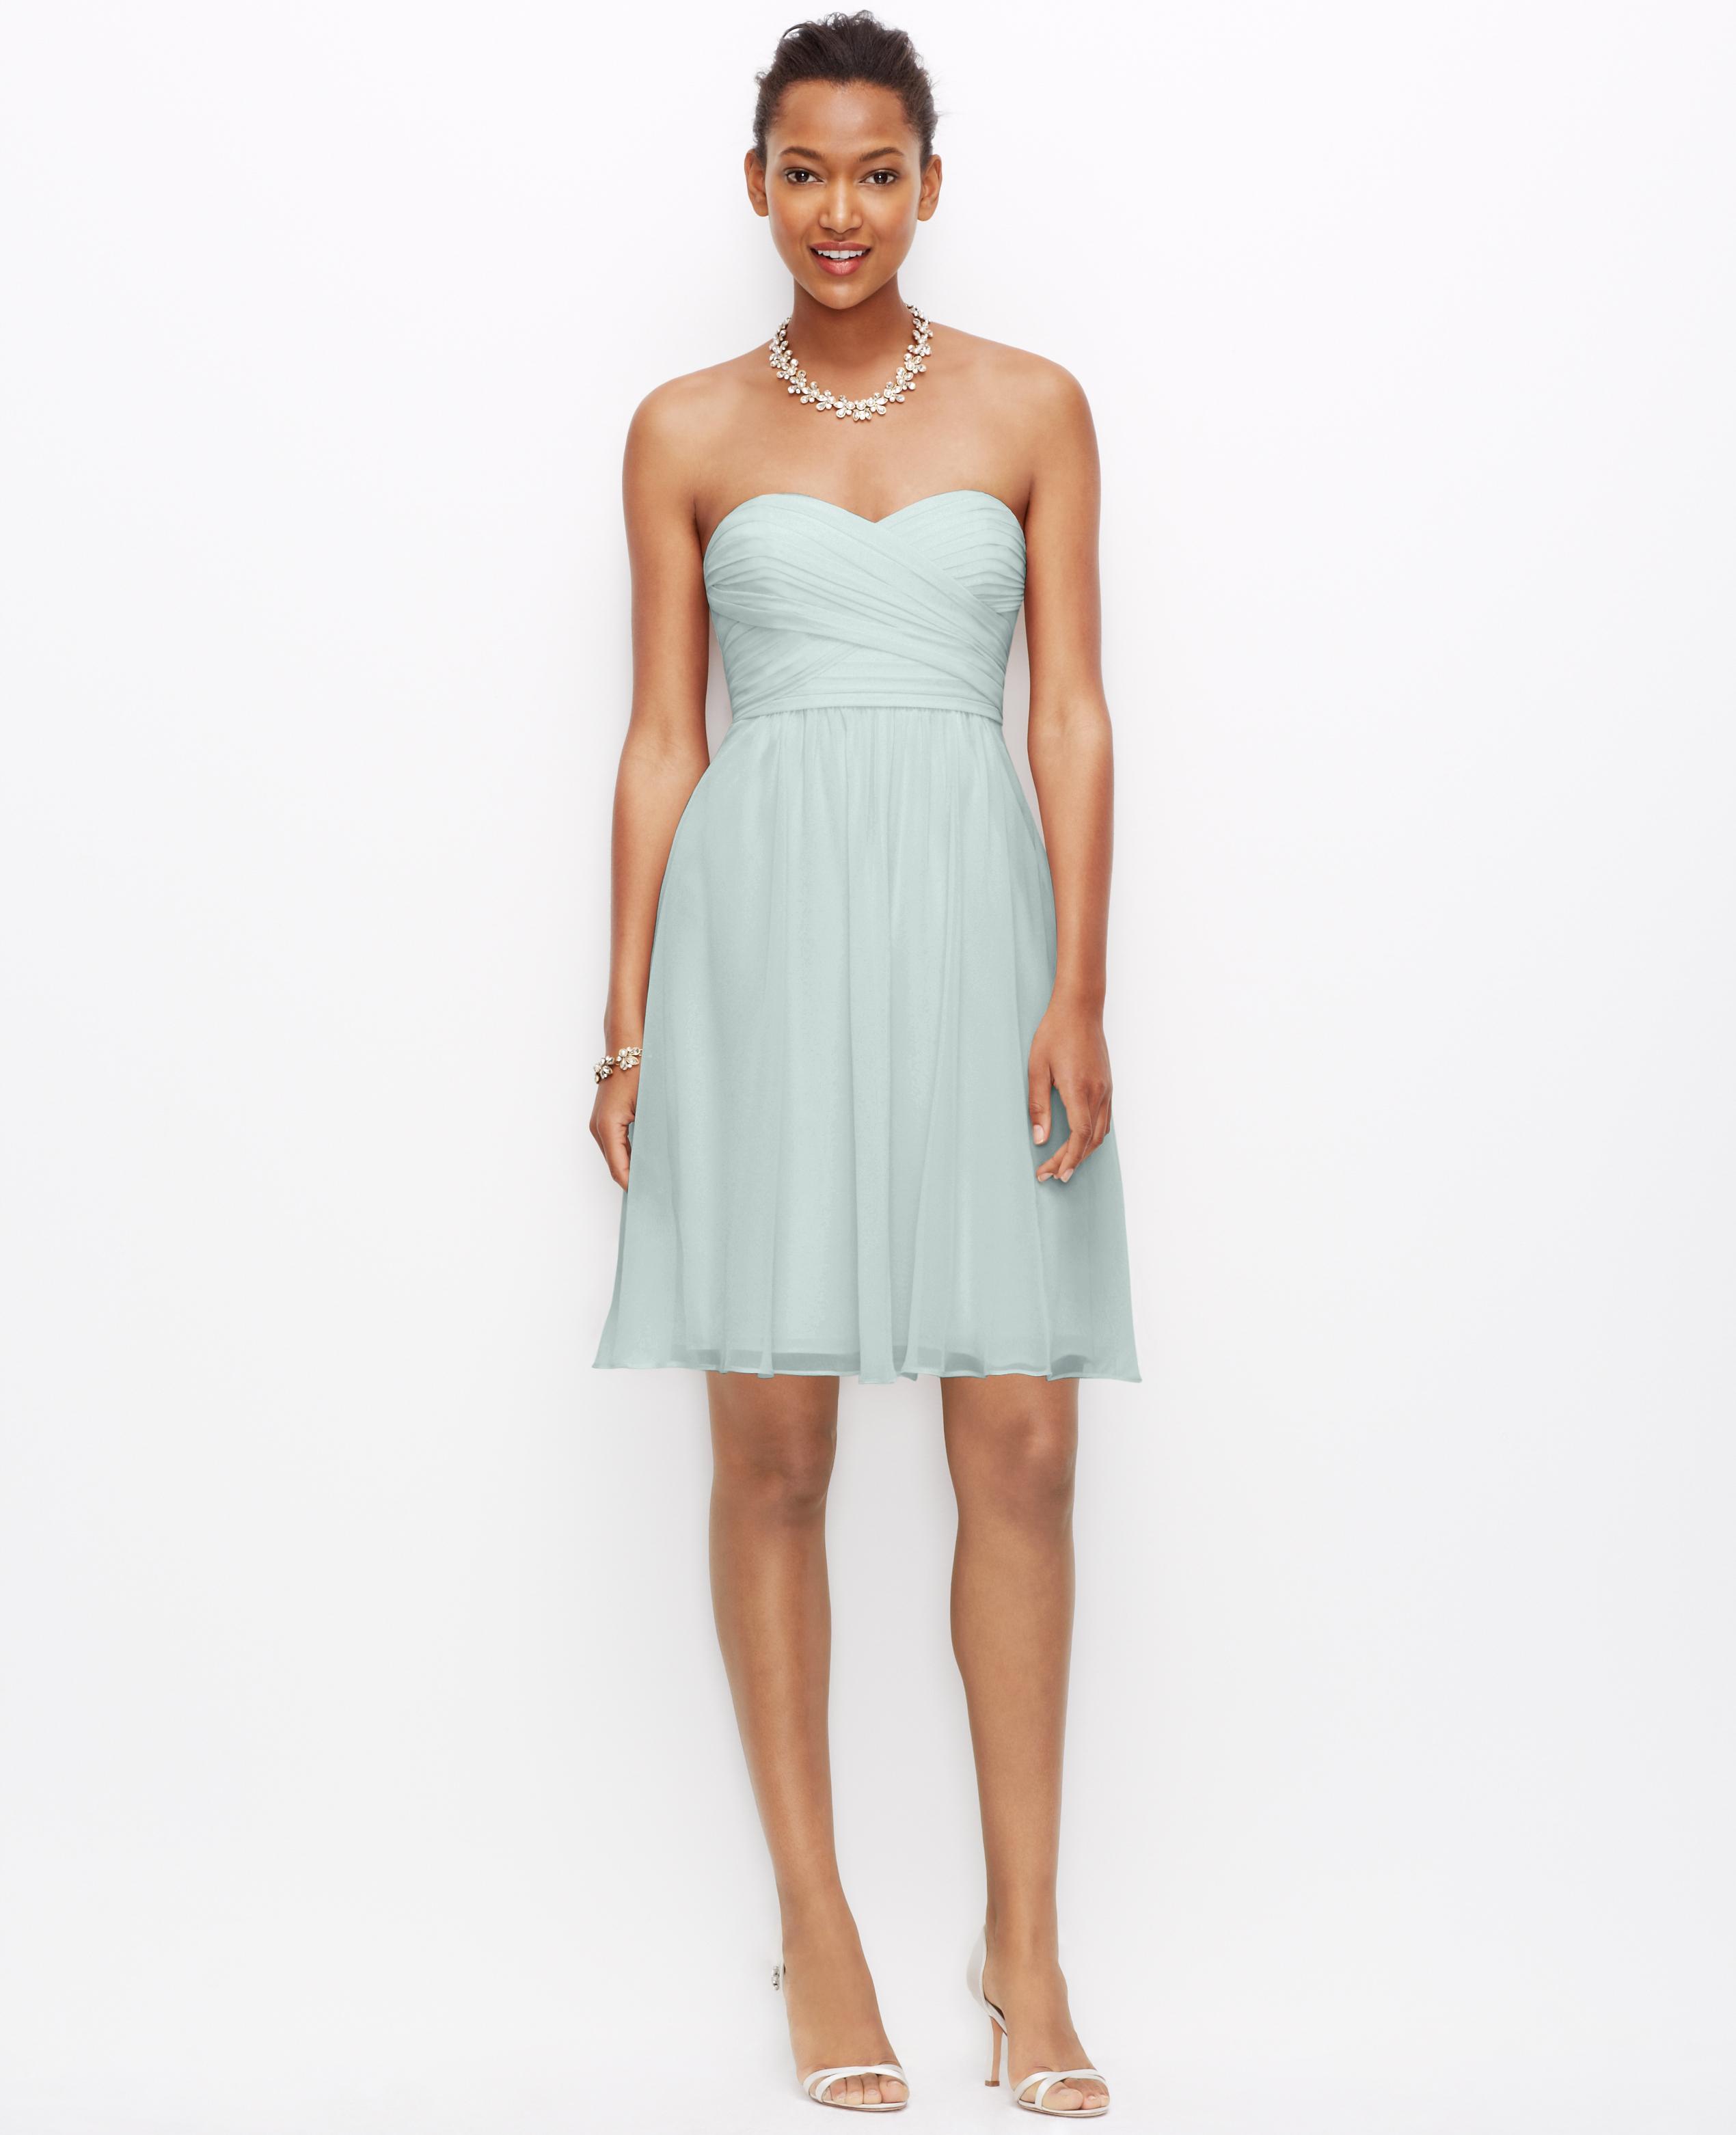 Lyst - Ann Taylor Petite Silk Georgette Strapless Dress in Blue